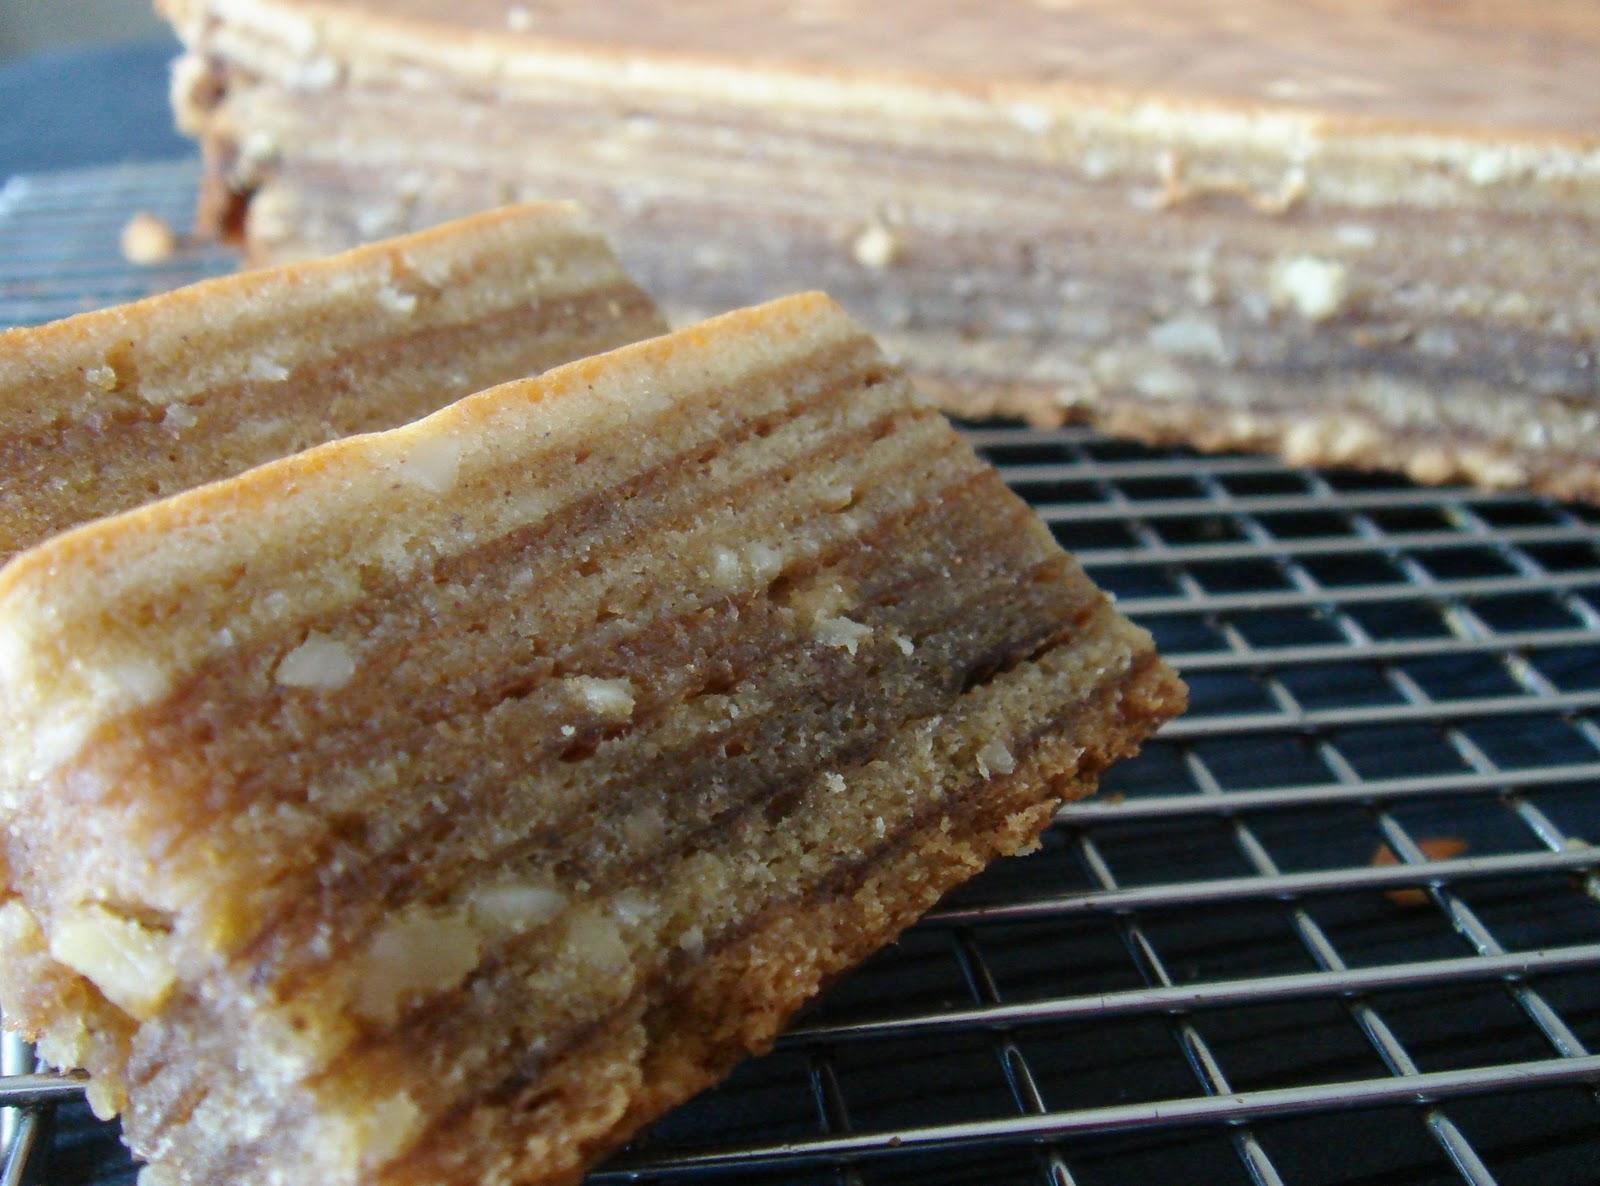 Kue Lapis - Indonesian layered cake